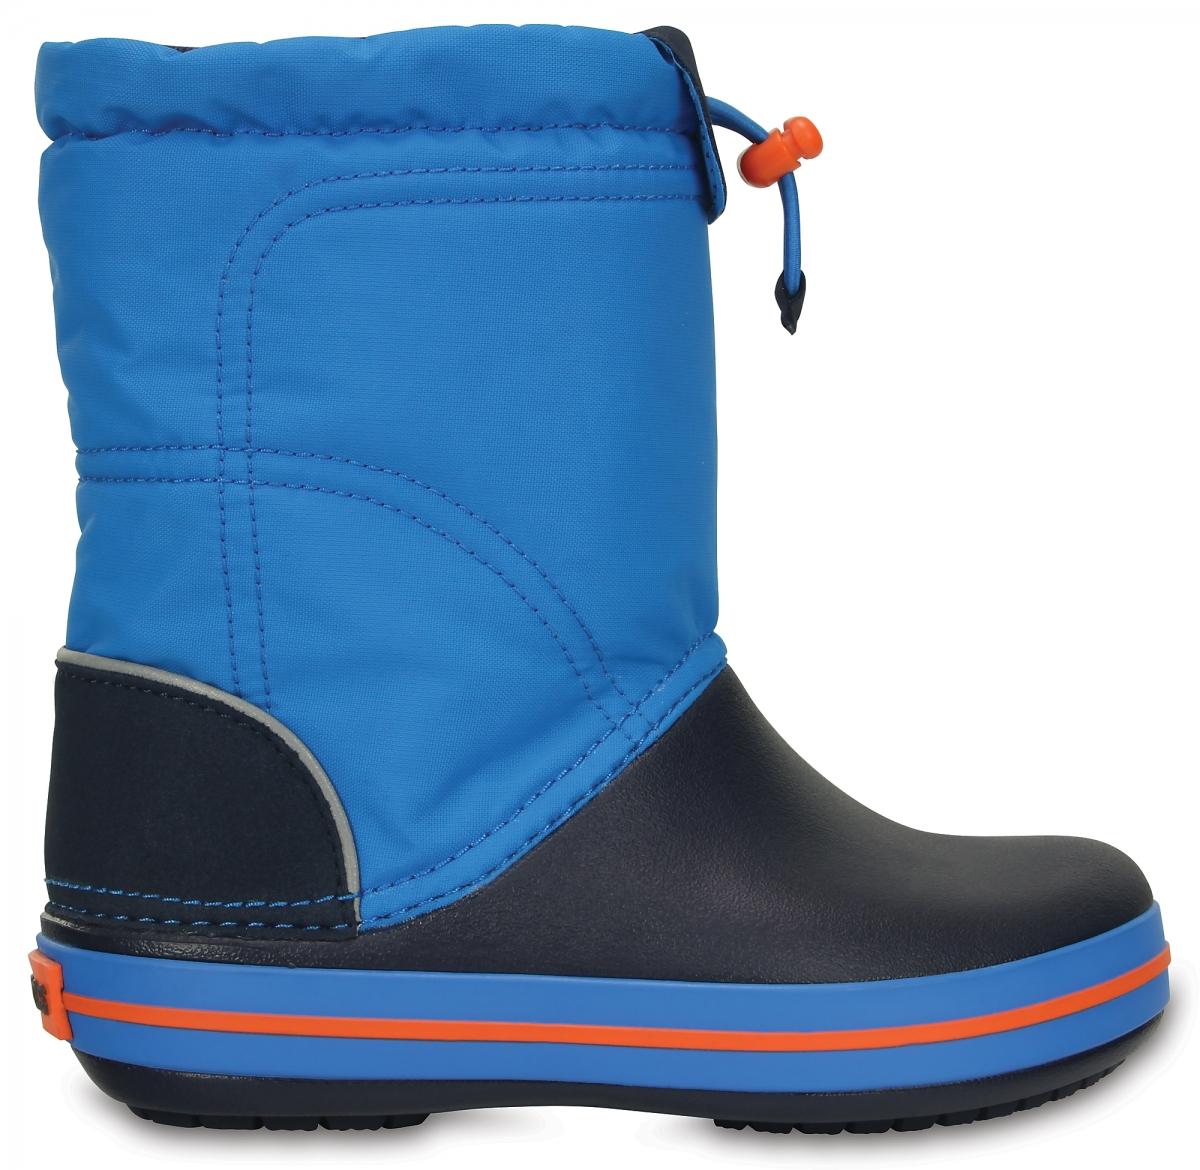 Crocs Crocband LodgePoint Boot Kids - Ocean/Navy, J2 (33-34)